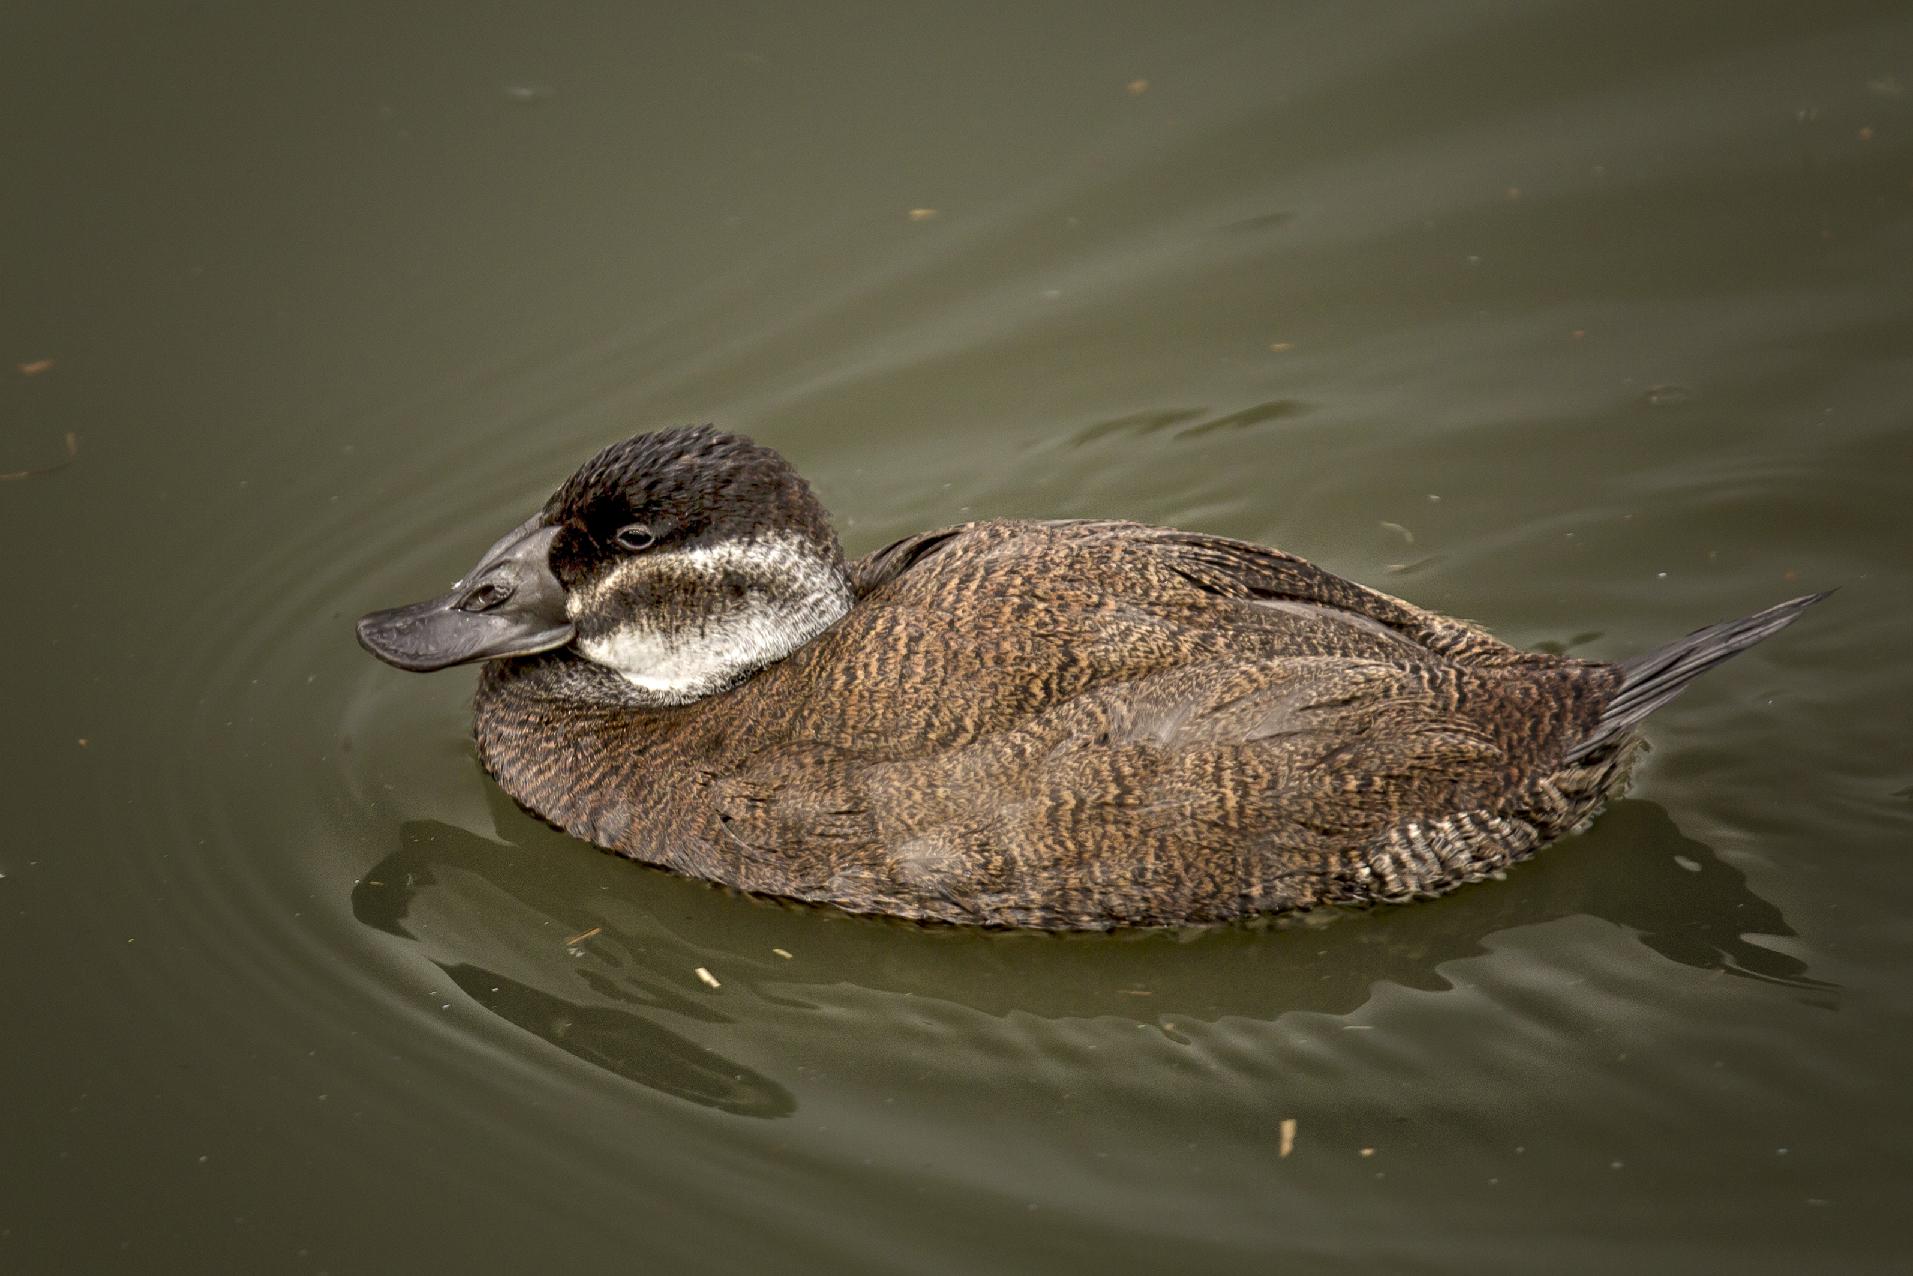 Bird Duck Fauna Water Beak Ducks Geese And Swans Waterfowl Mallard Feather Seaduck Wildlife